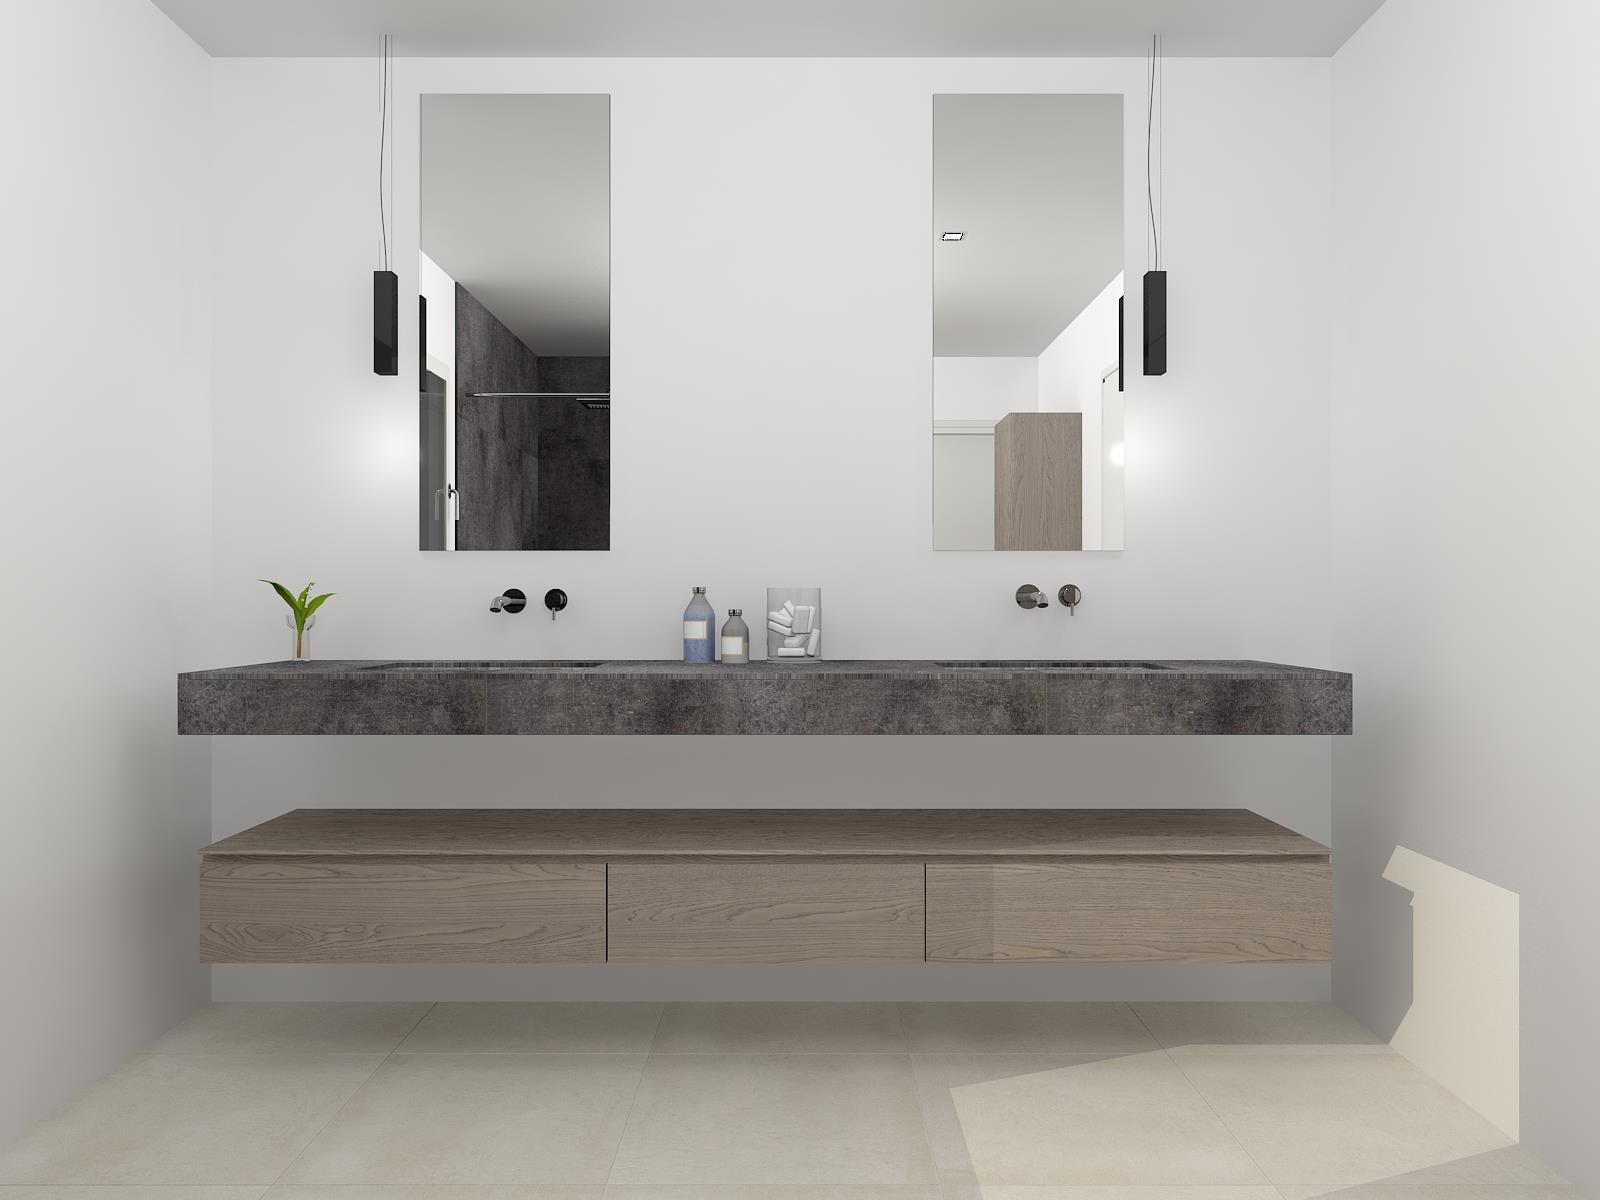 Mattout carrelage deb14221 v3 2 bathroom by mattout for Mattout carrelage